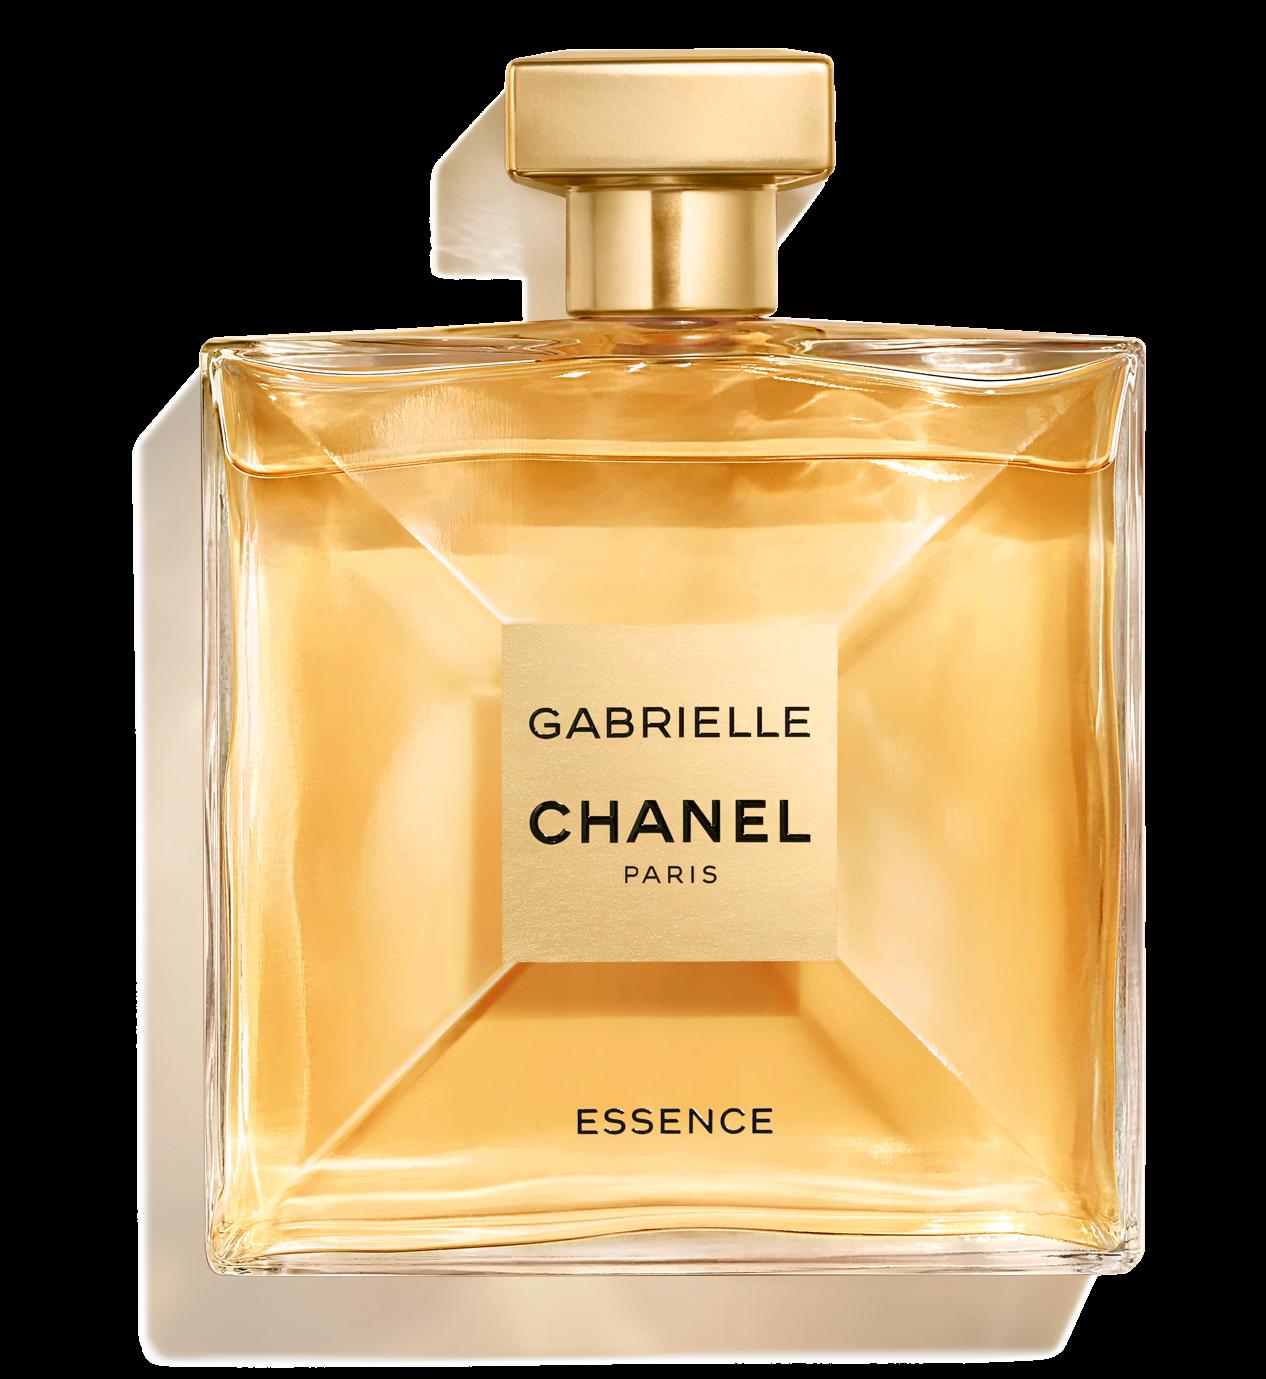 CHANEL_GABRIELLE_ESSENCE